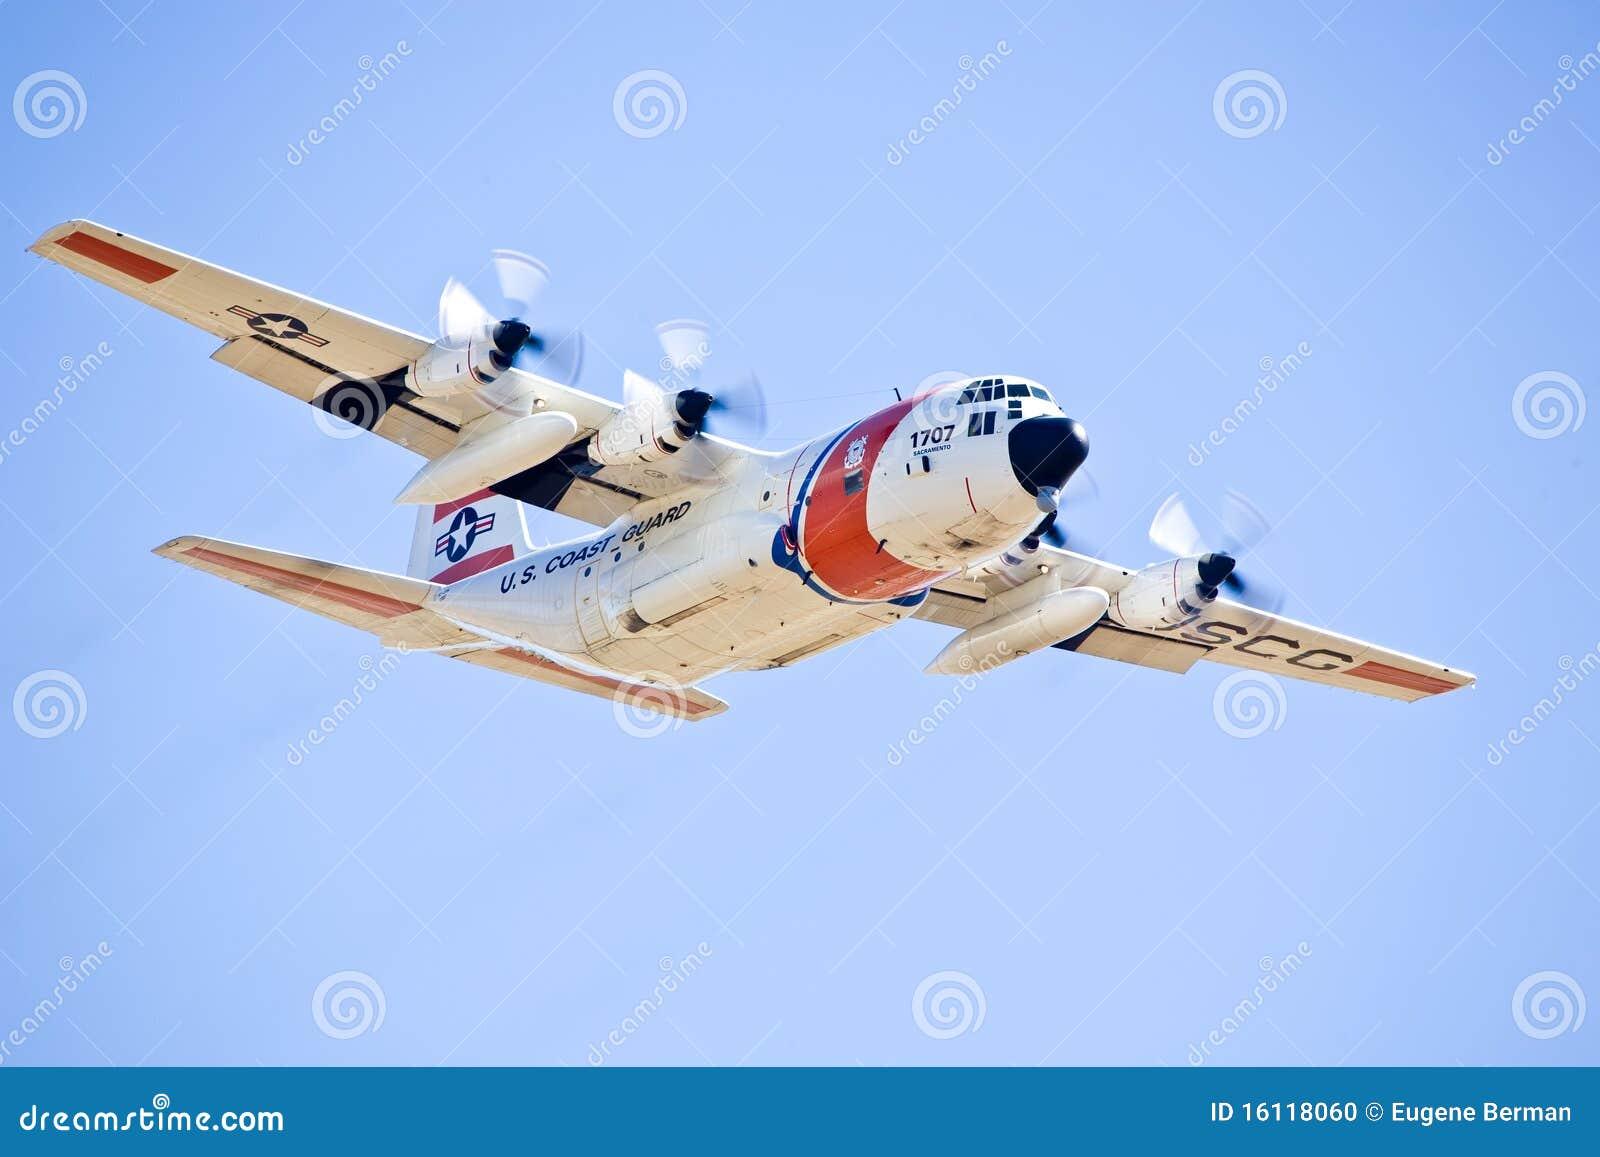 Premier Designs California Capital Airshow: US Coast Guard C-130 Hercules Editorial Image